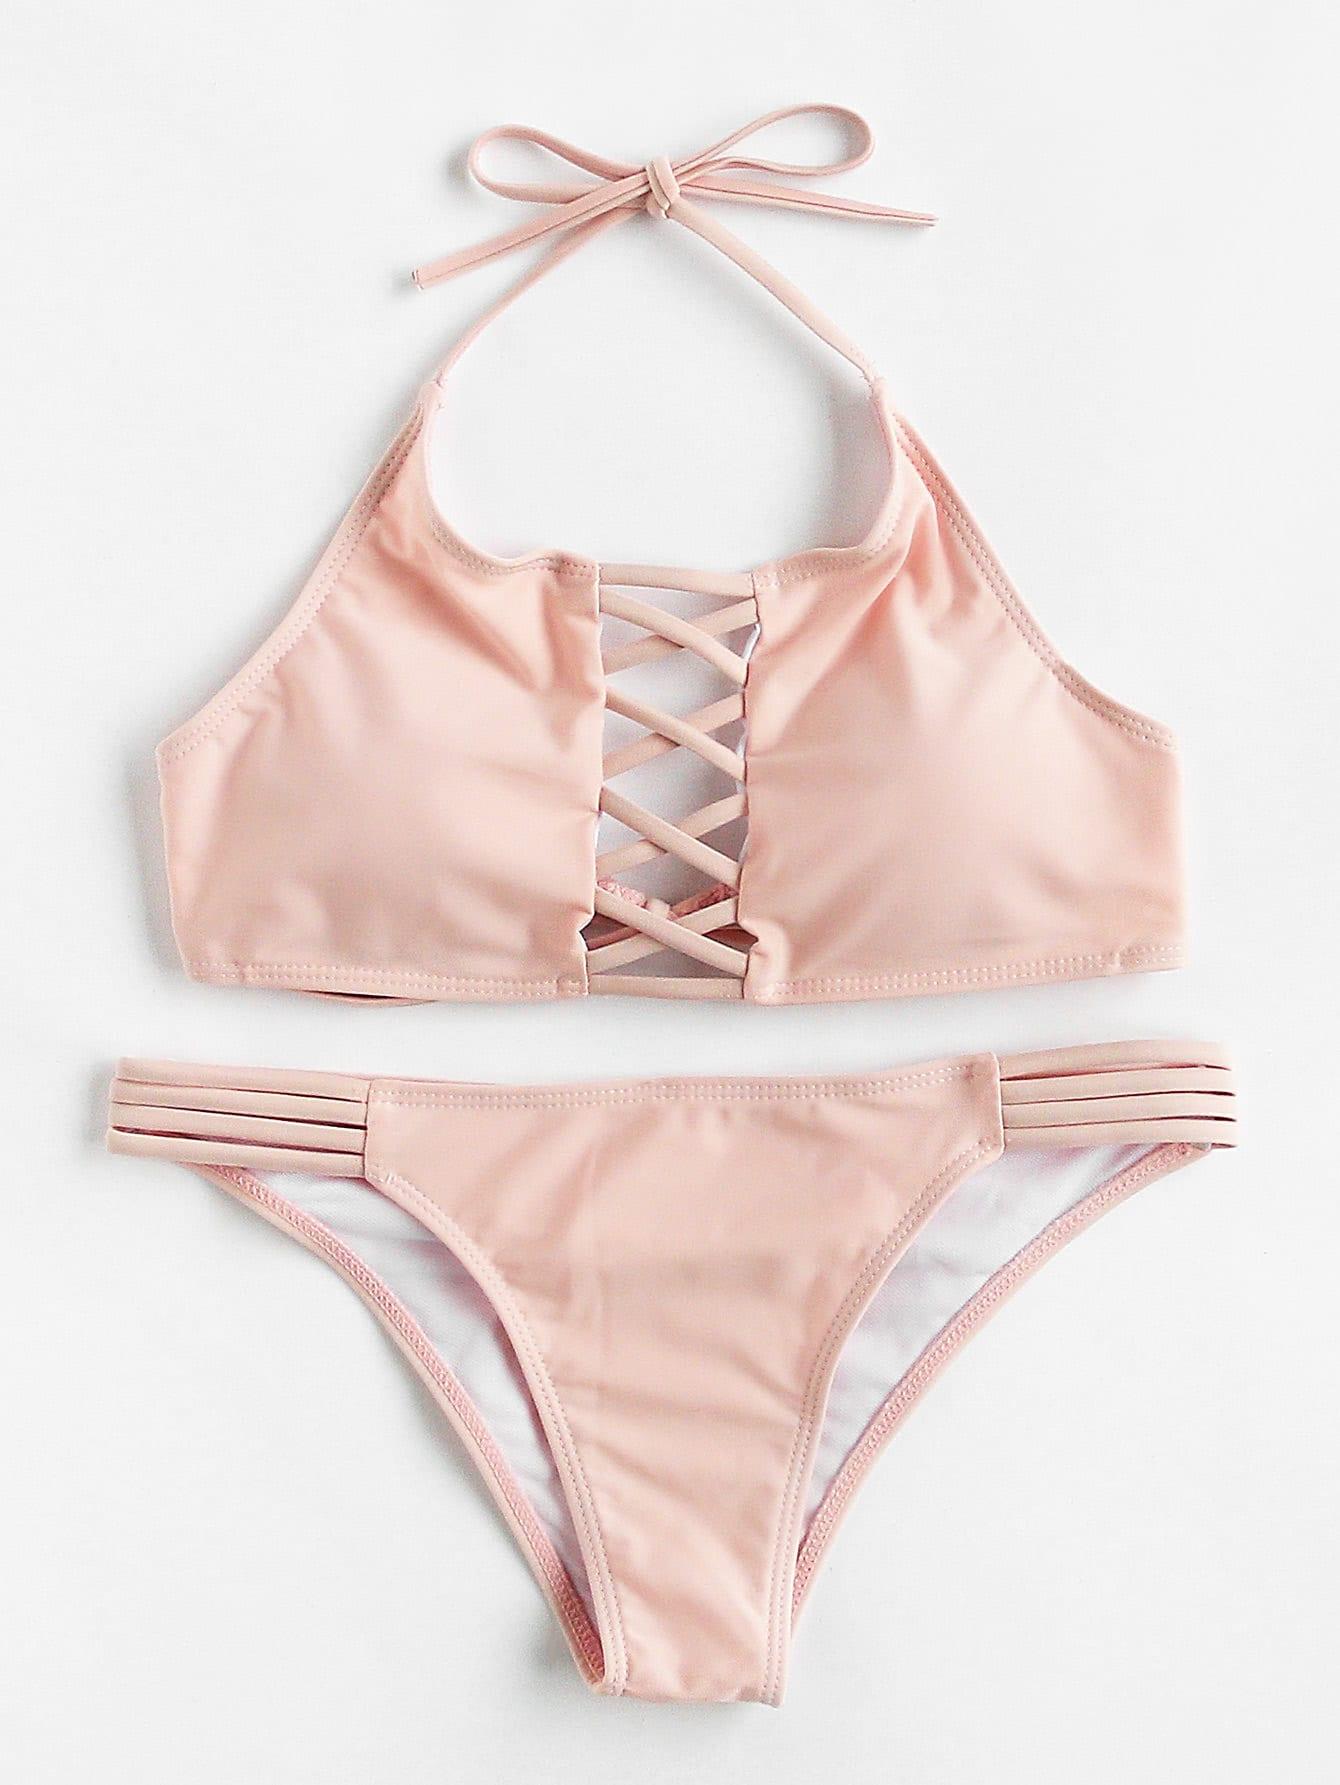 Criss Cross Ladder Cutout Halter Bikini Set swimwear170704311